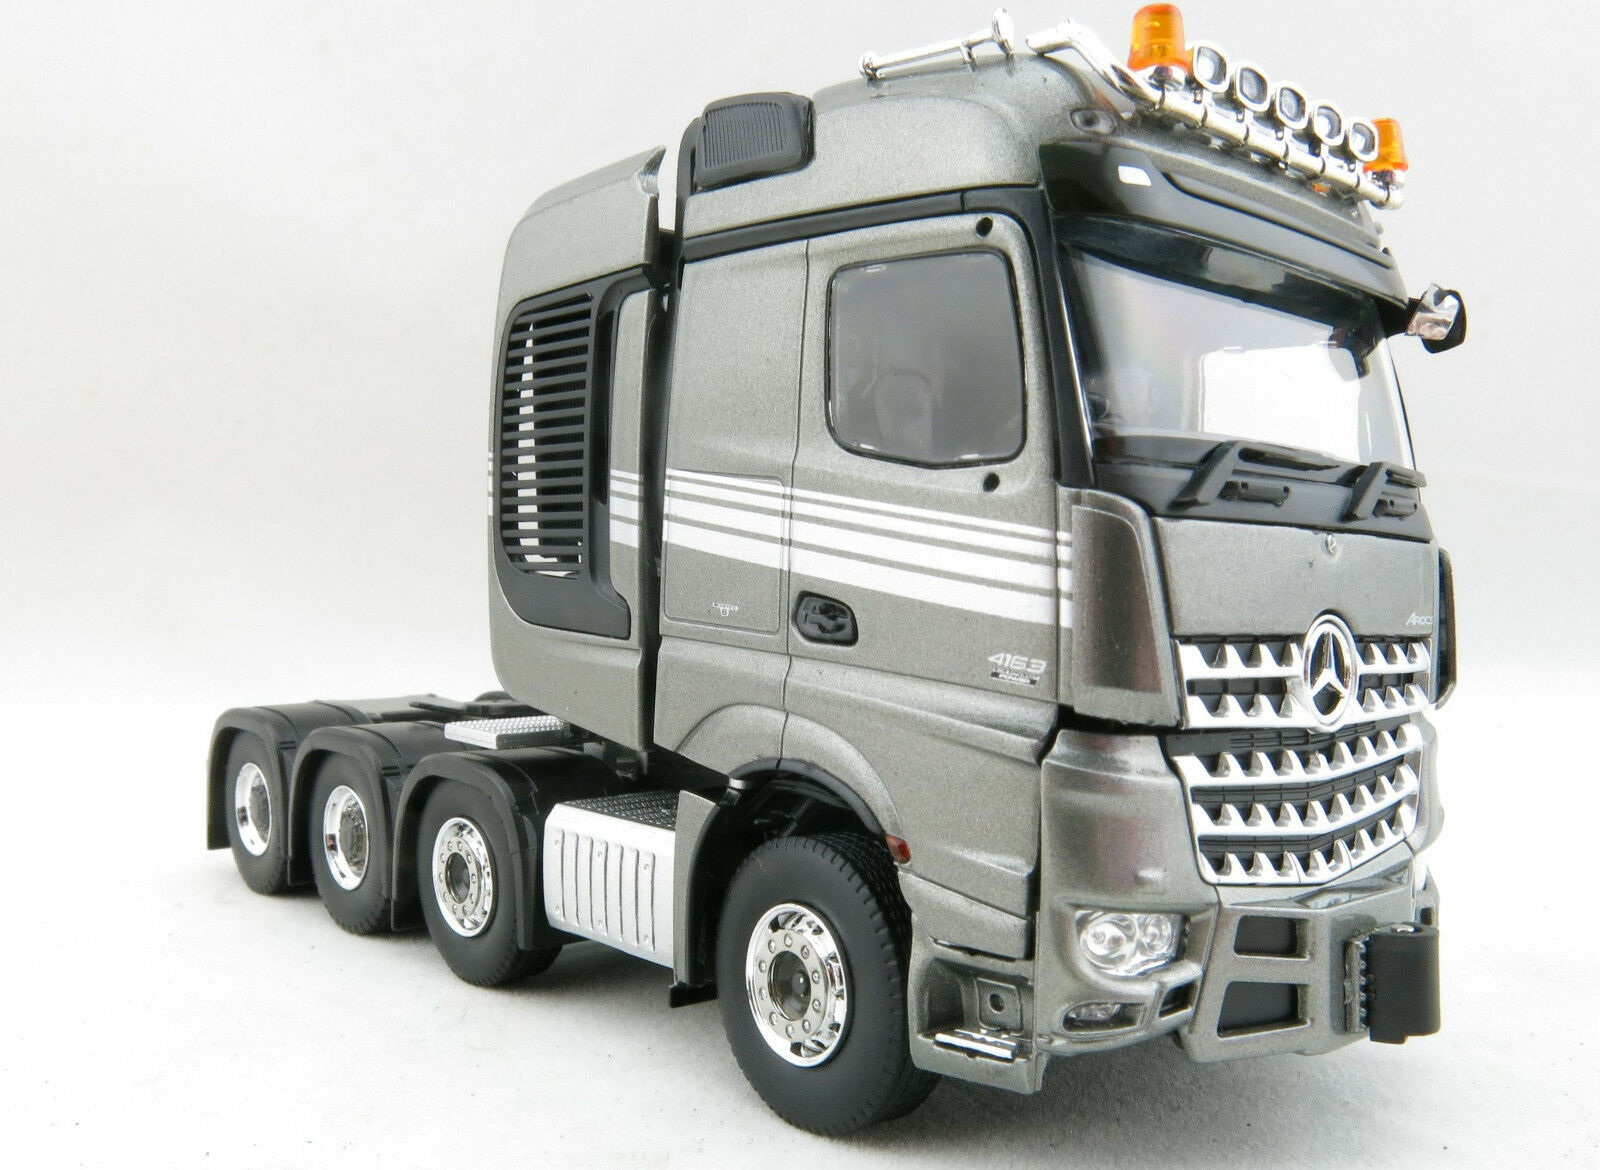 Tekno 71173 Mercedes-Benz Arocs SLT 8x4 Prime Mover - Right Hand Drive - Scale 1